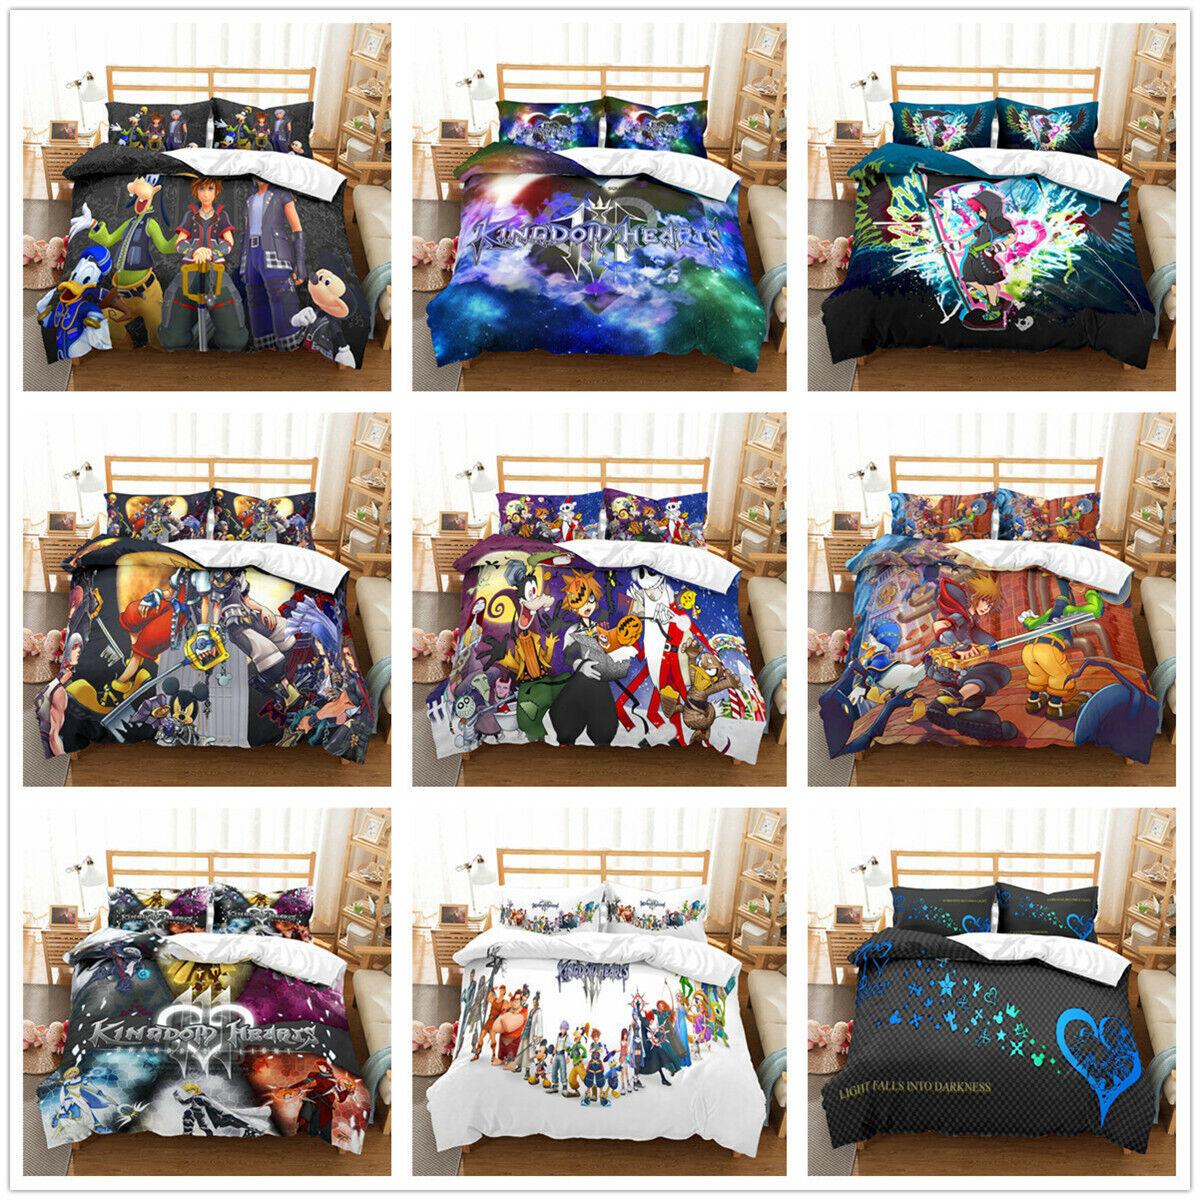 3D Kingdom Hearts Anime Duvet Cover Bedding Set Quilt Comforter Cover Pillowcase